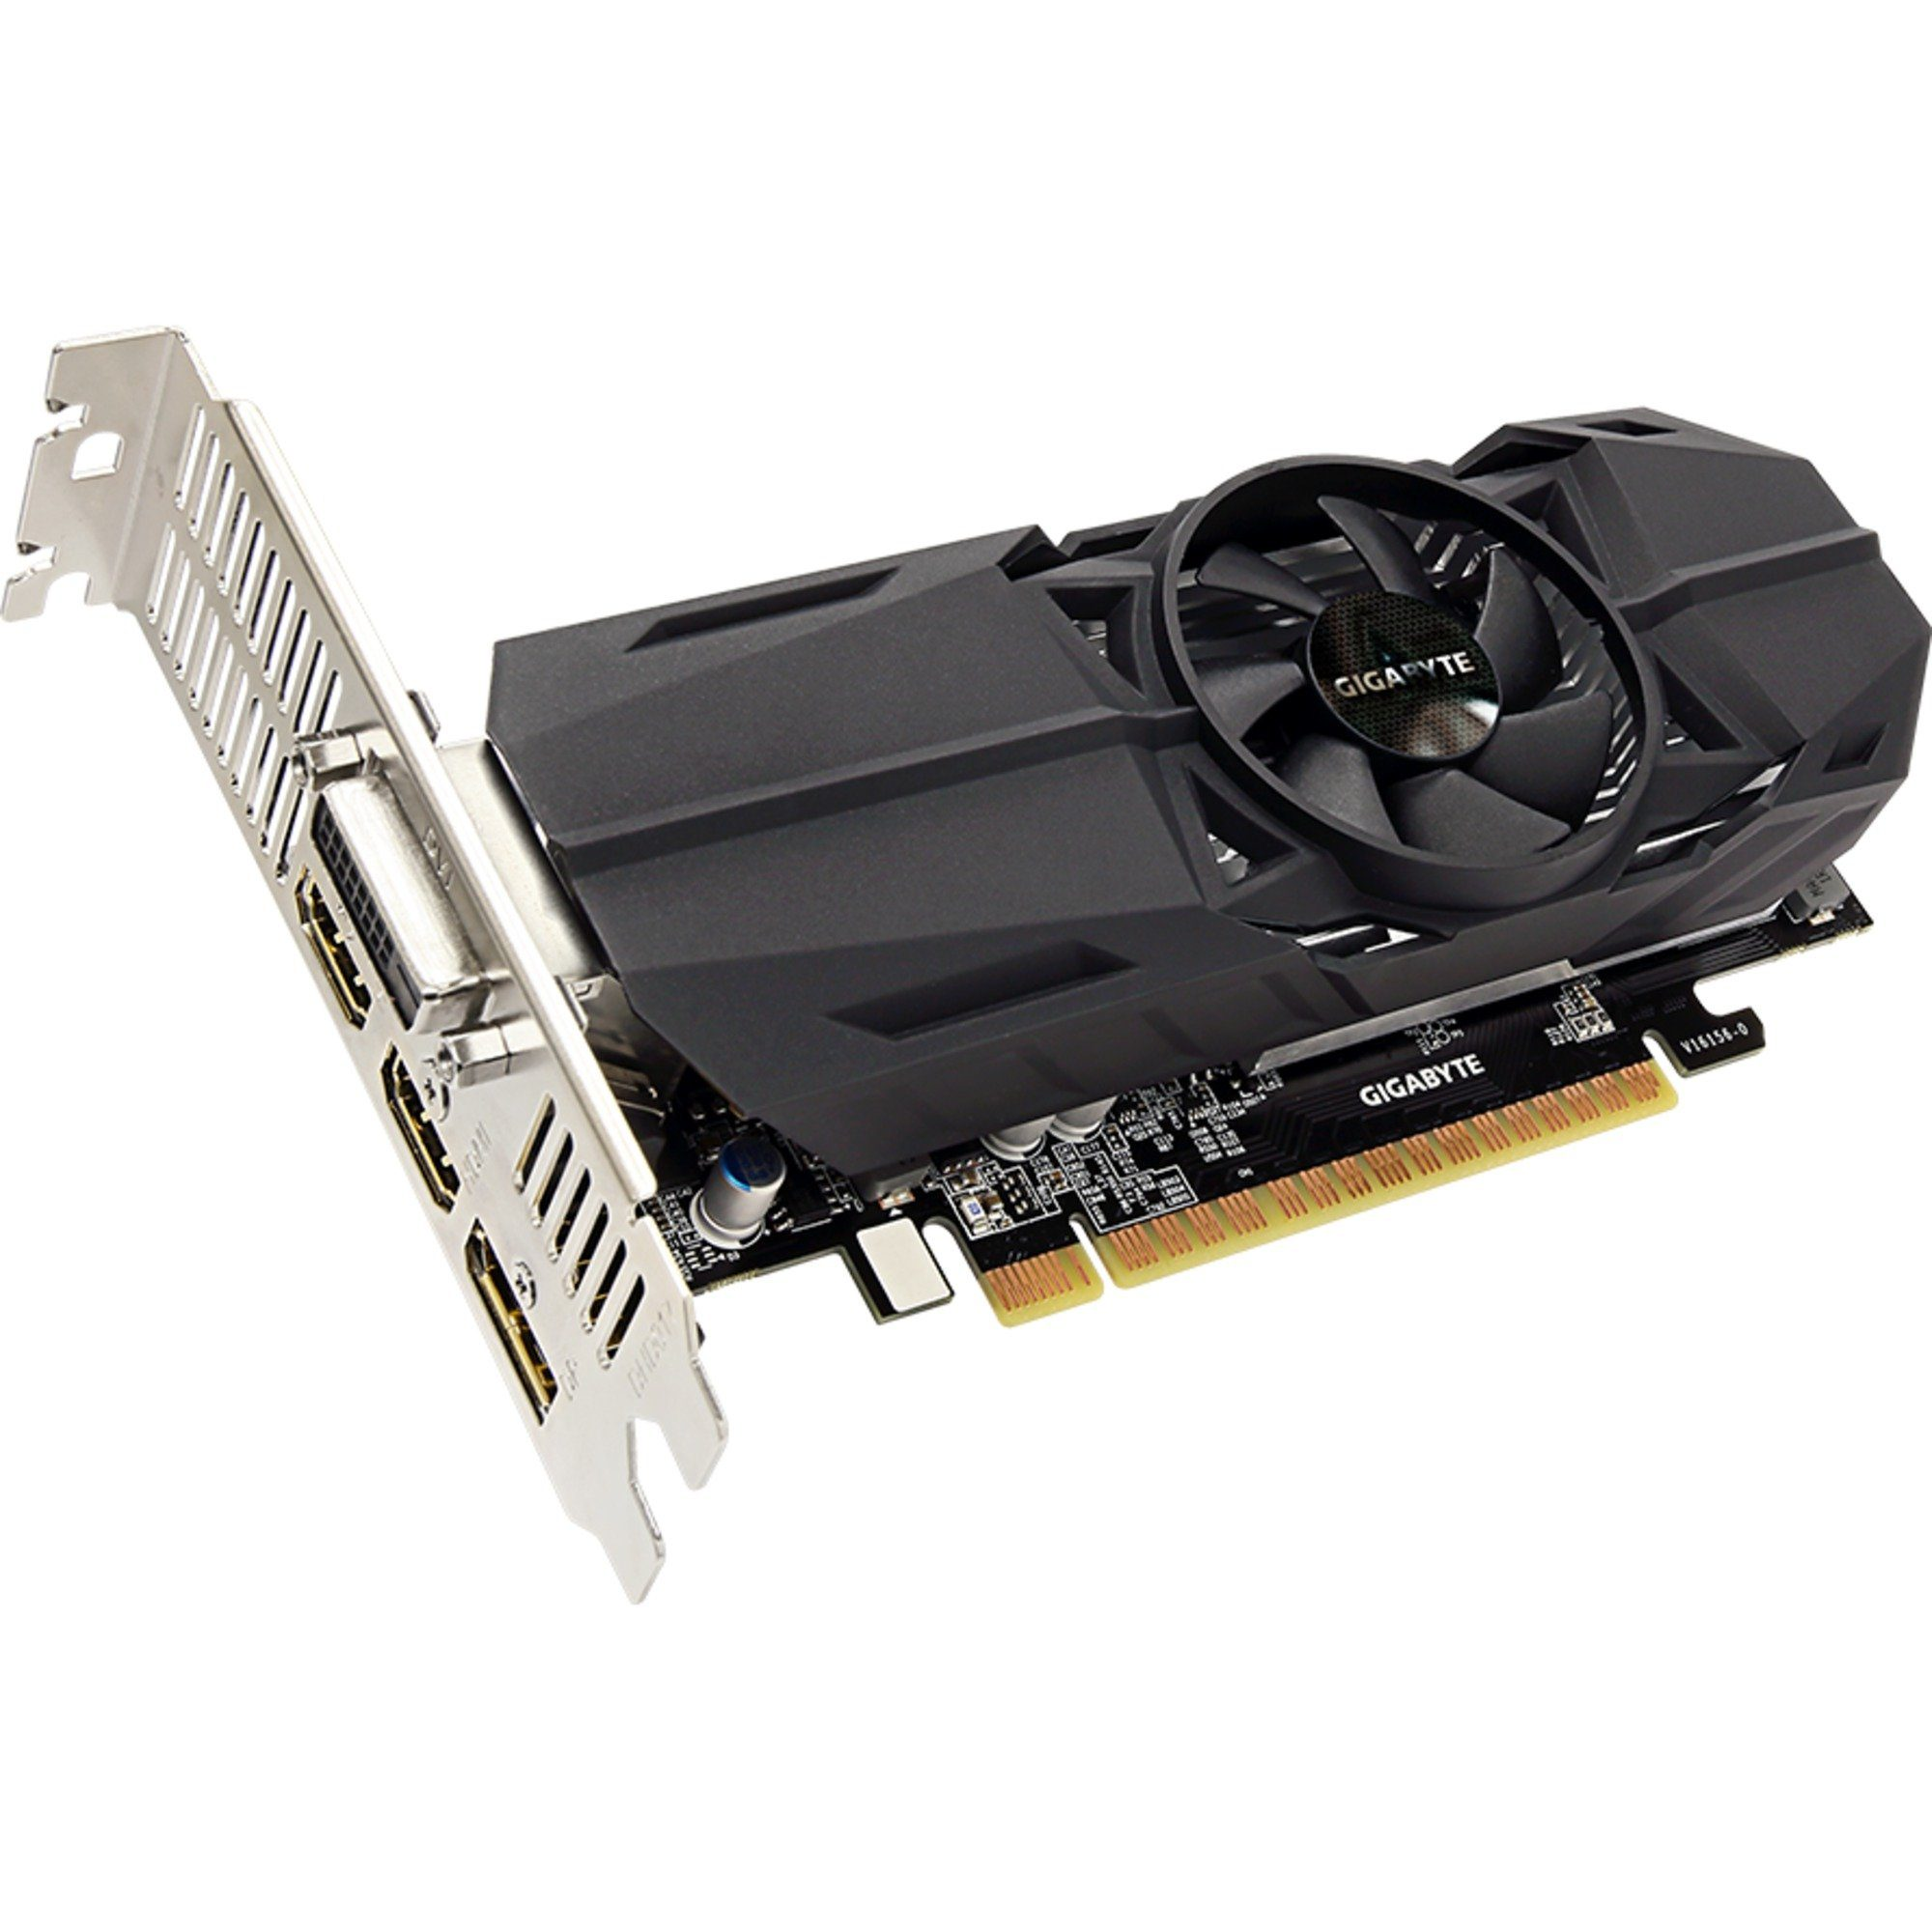 GIGABYTE Grafikkarte »GeForce GTX 1050 Ti OC LP«